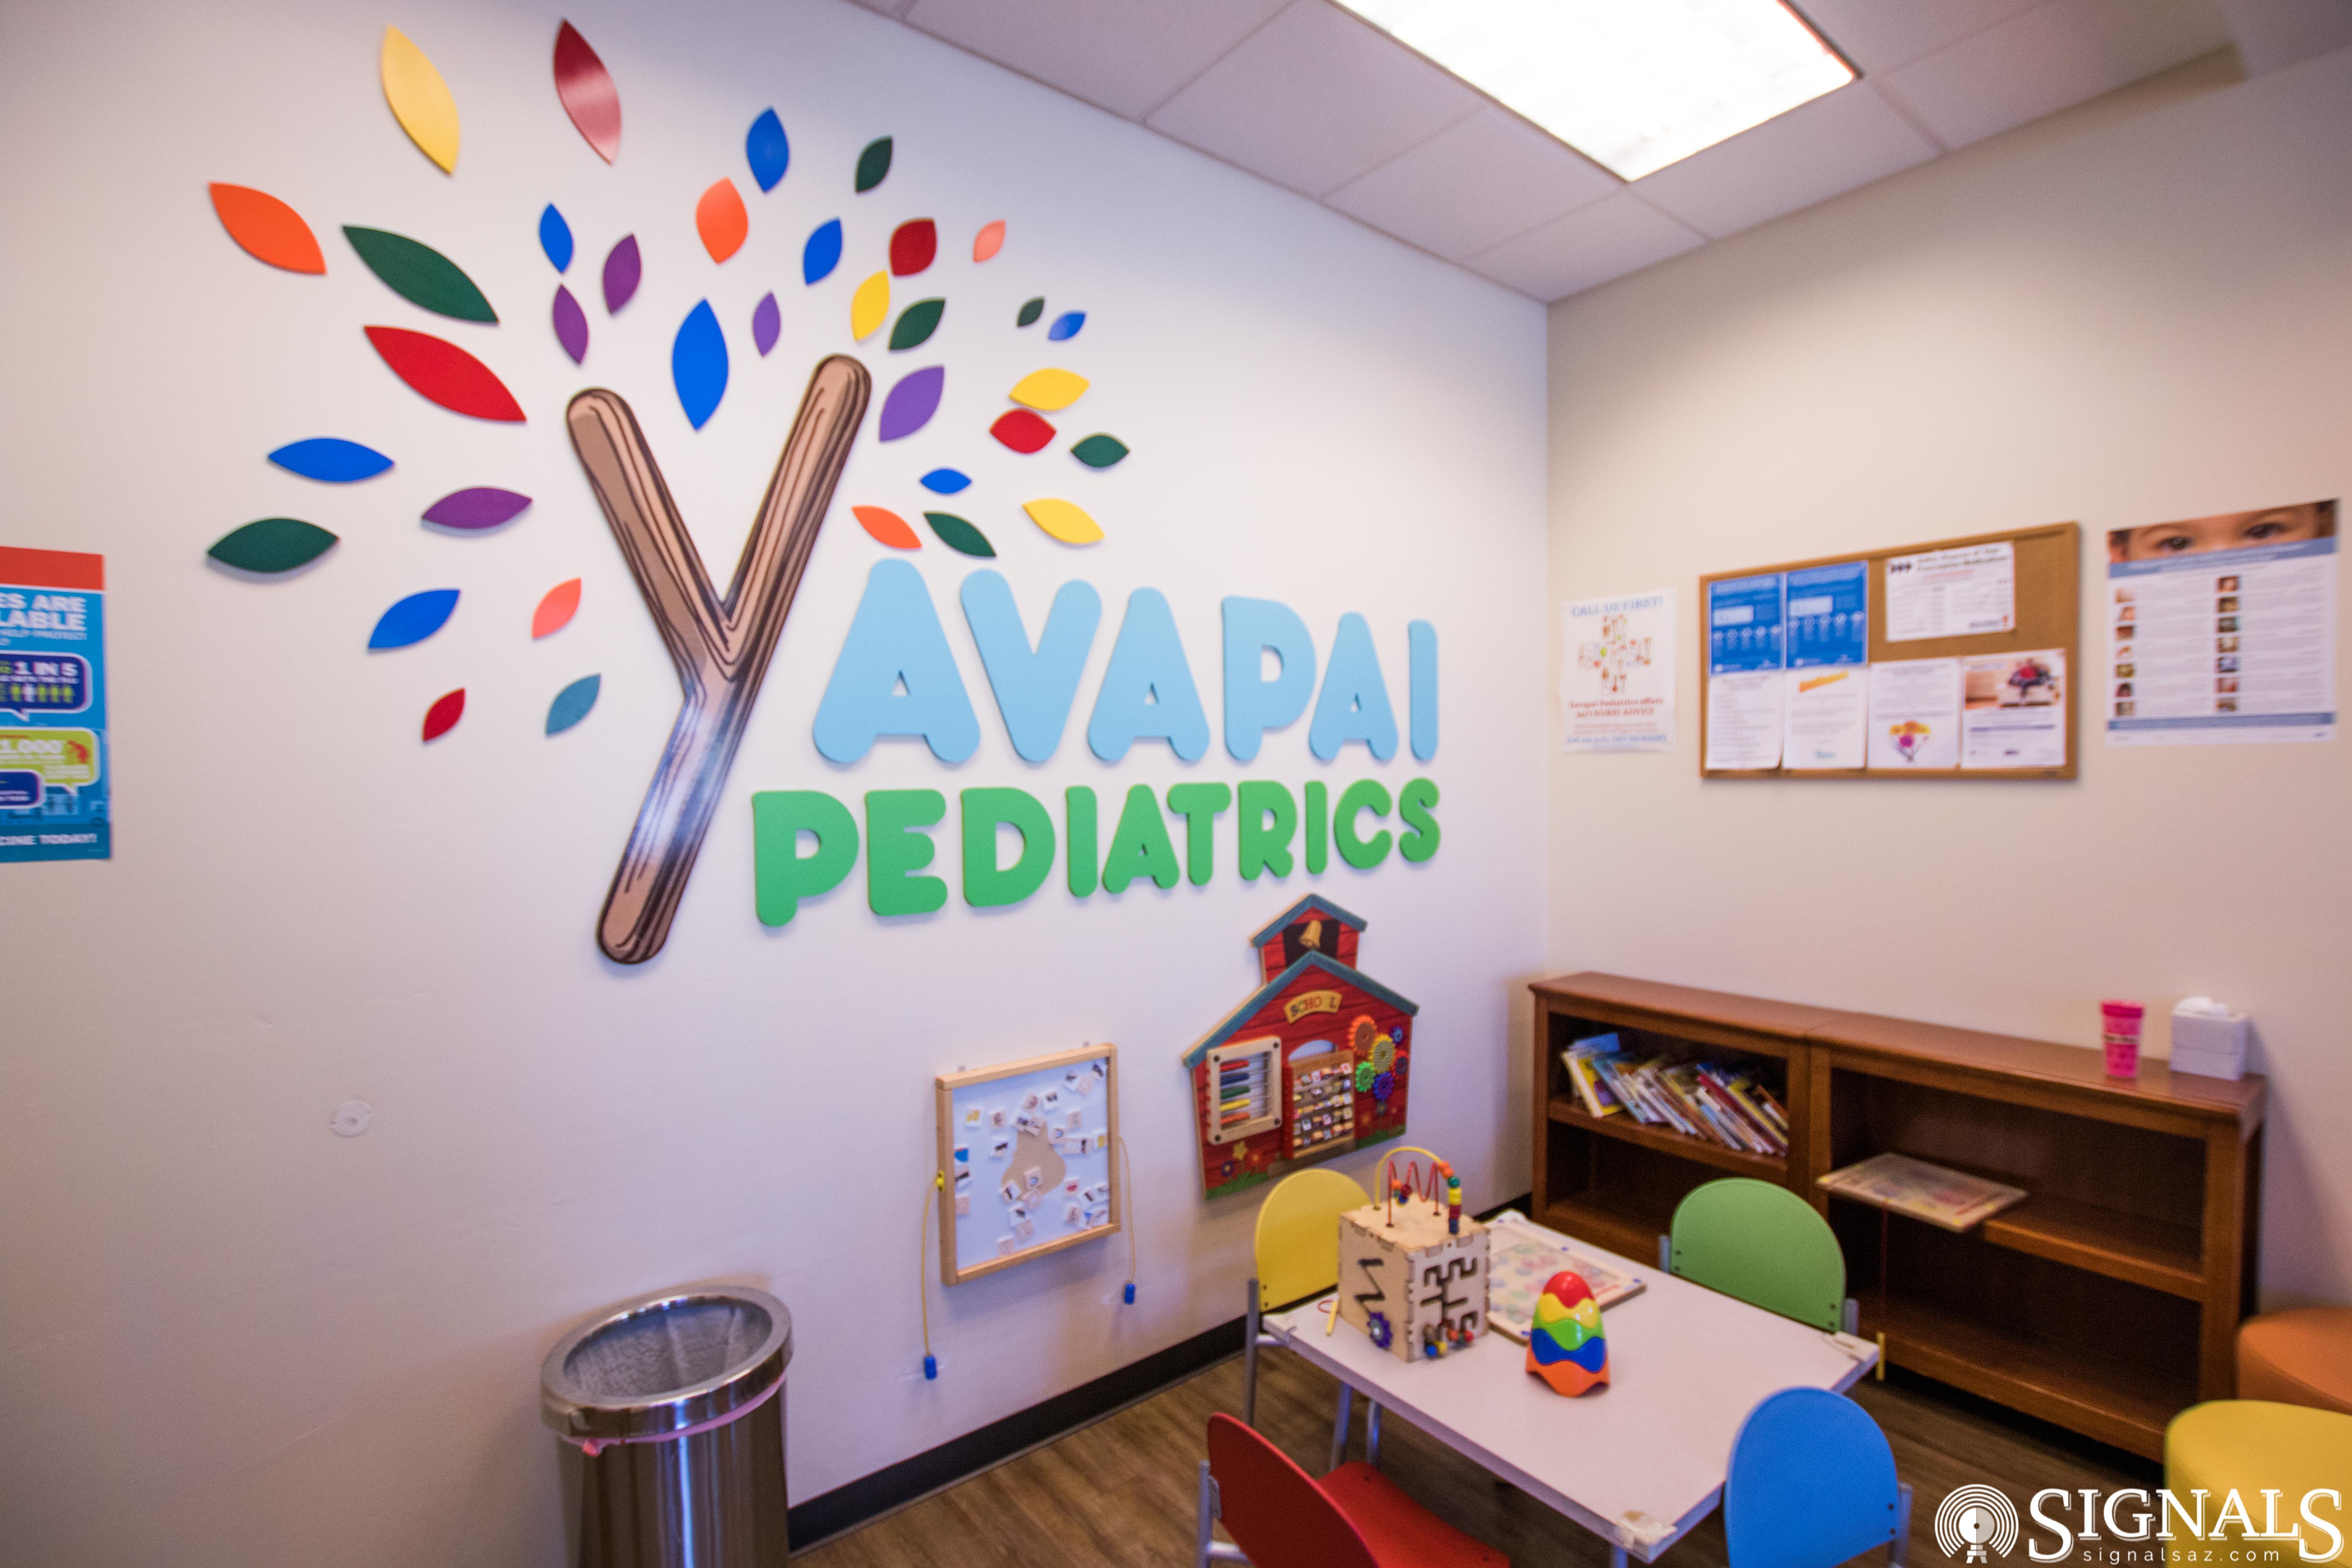 Yavapai Pediatrics Is Helping Raise Northern Arizona's Future One